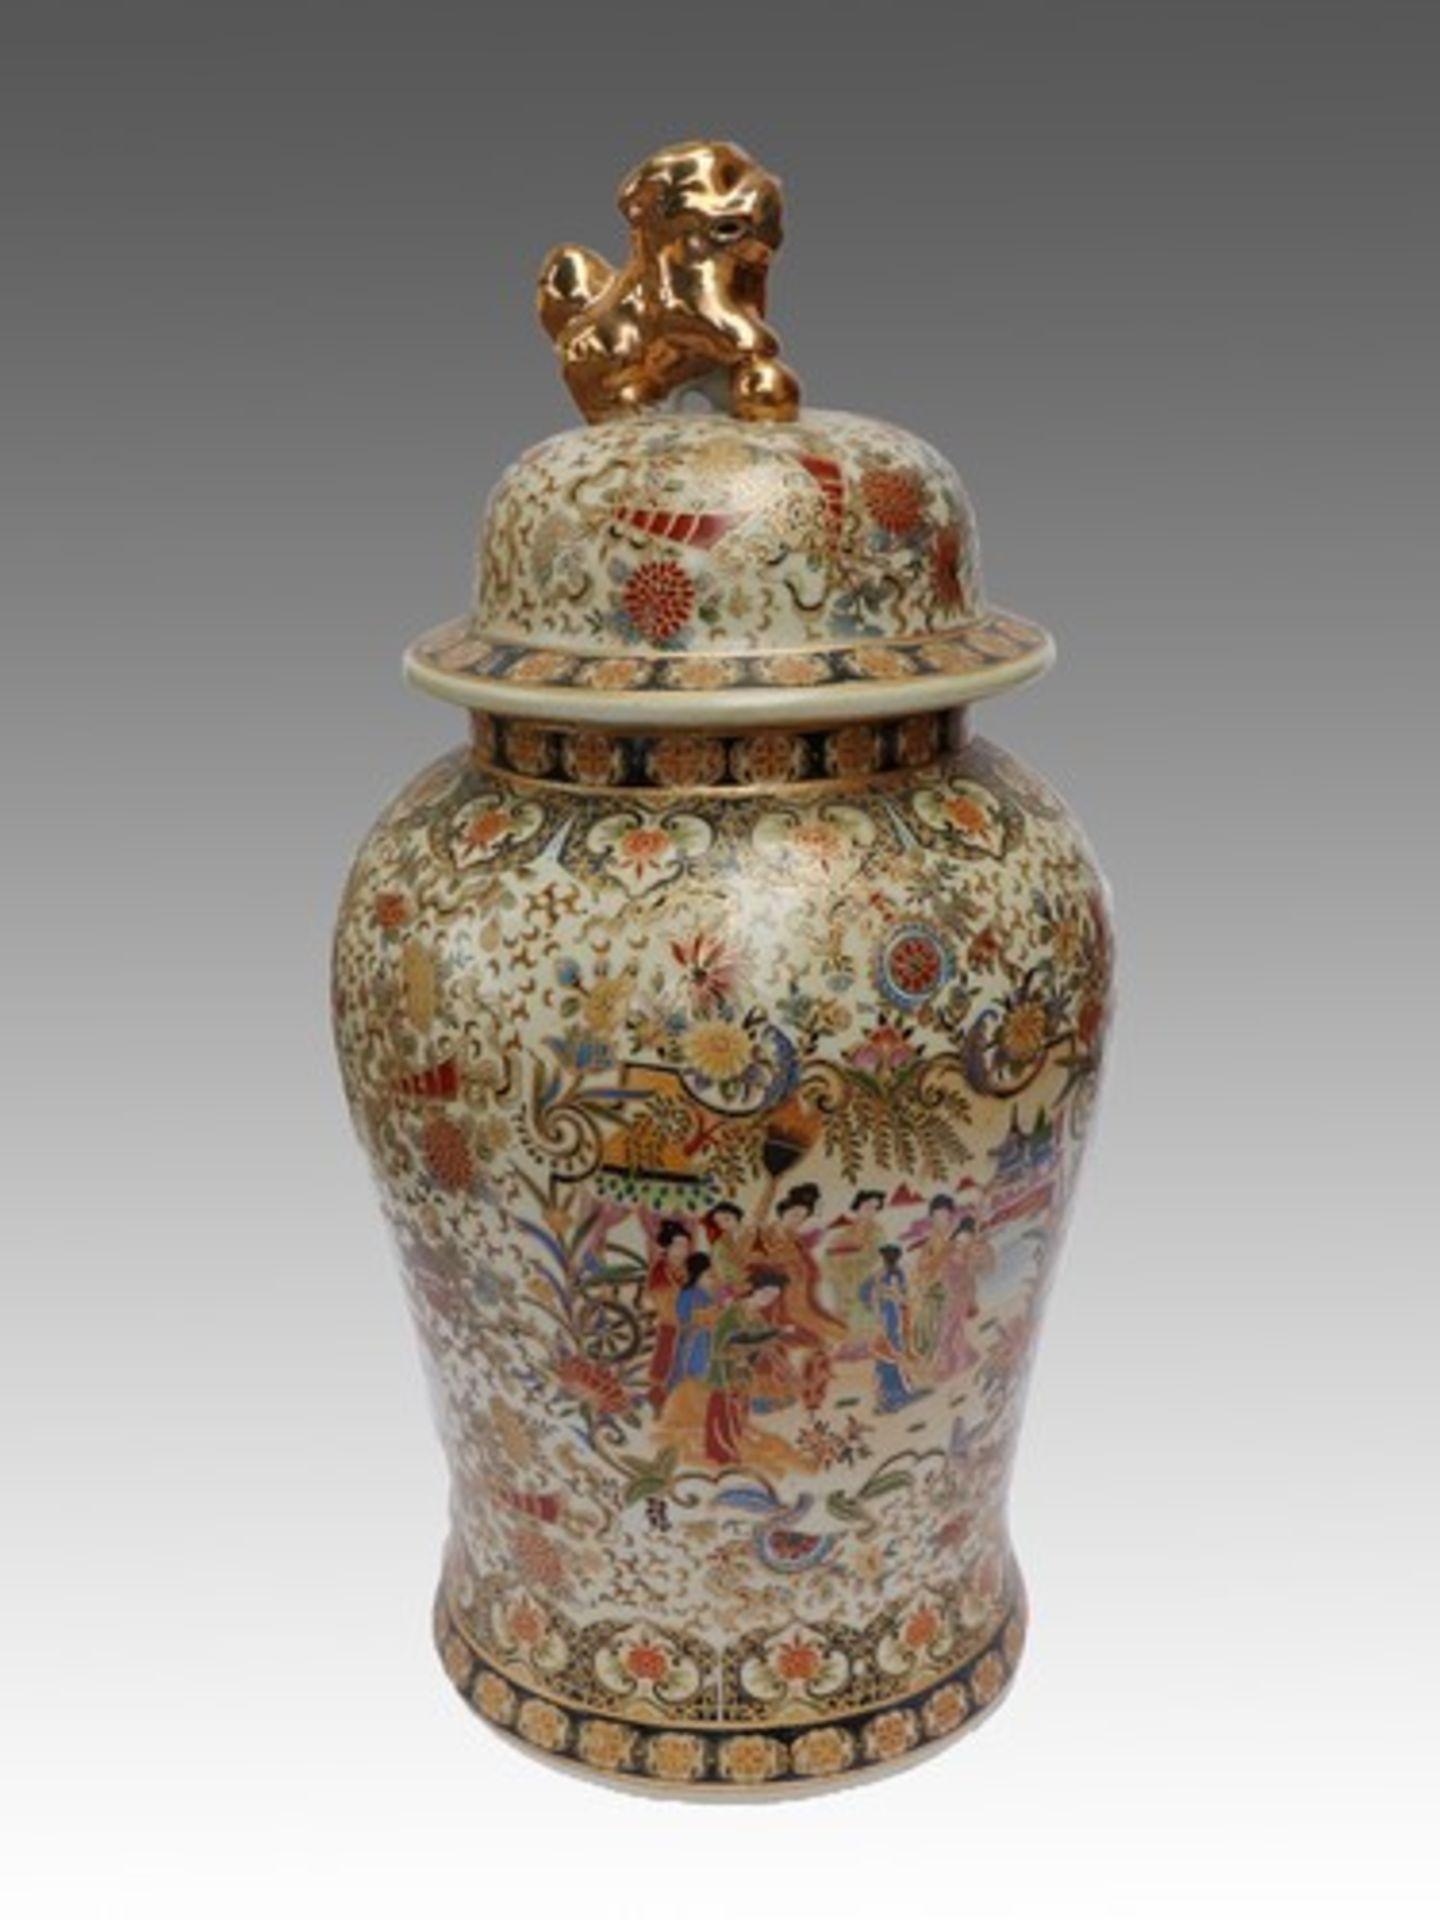 Los 1834 - Große Deckelvase20.Jh., China, Keramik, umlaufend polychrom bemalt u. m. Umdruckdekor verziert,